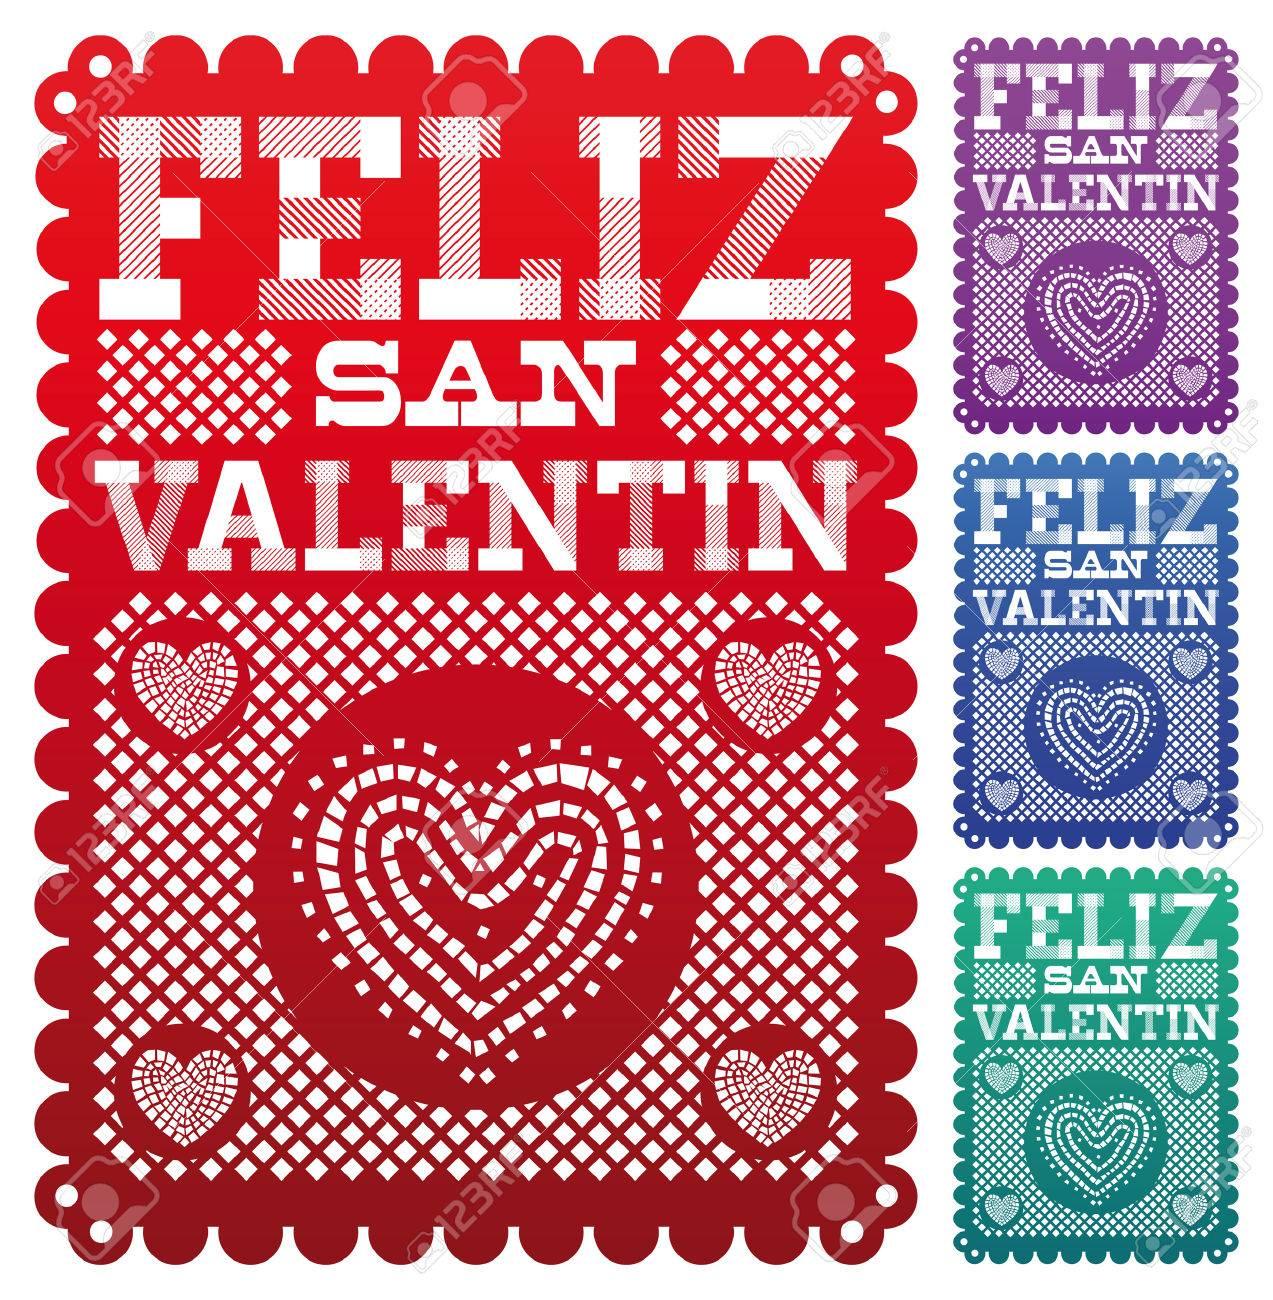 San Valentin Decoration Feliz San Valentin Happy Valentines Day Spanish Text Latin